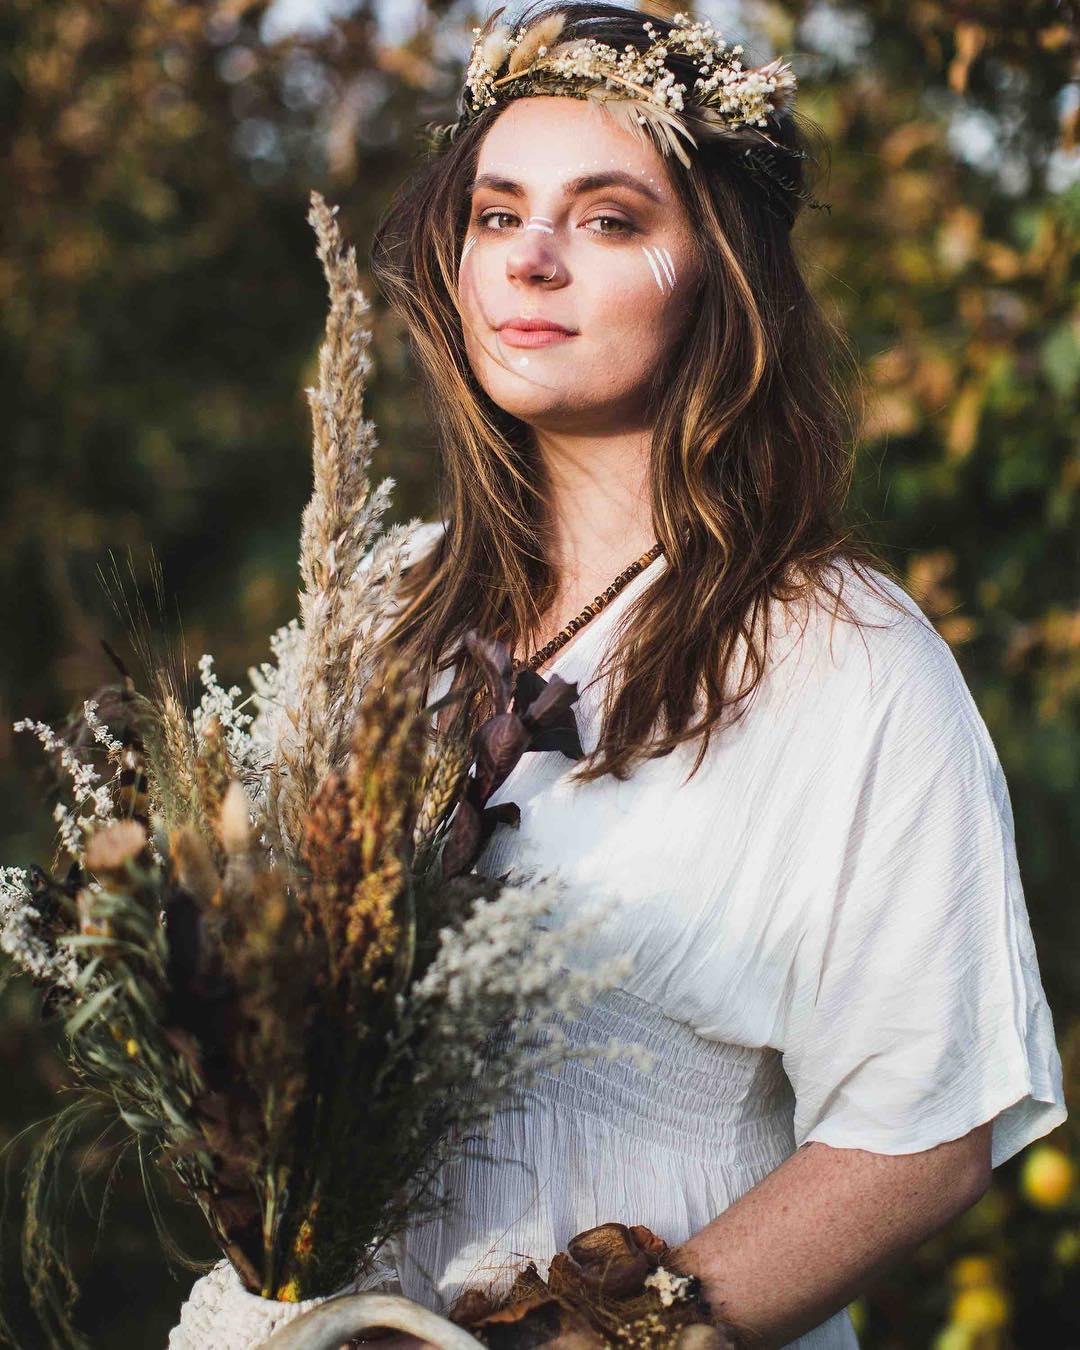 {maggs🍁🌿🍂} photo | @erikafollansbee . . #boho #bohostyle #goddess #heritage #gorgeous #interesting #bouquet #antler #driedflowers #beyourself #styledshoot #collaborate #weddingdesign #love